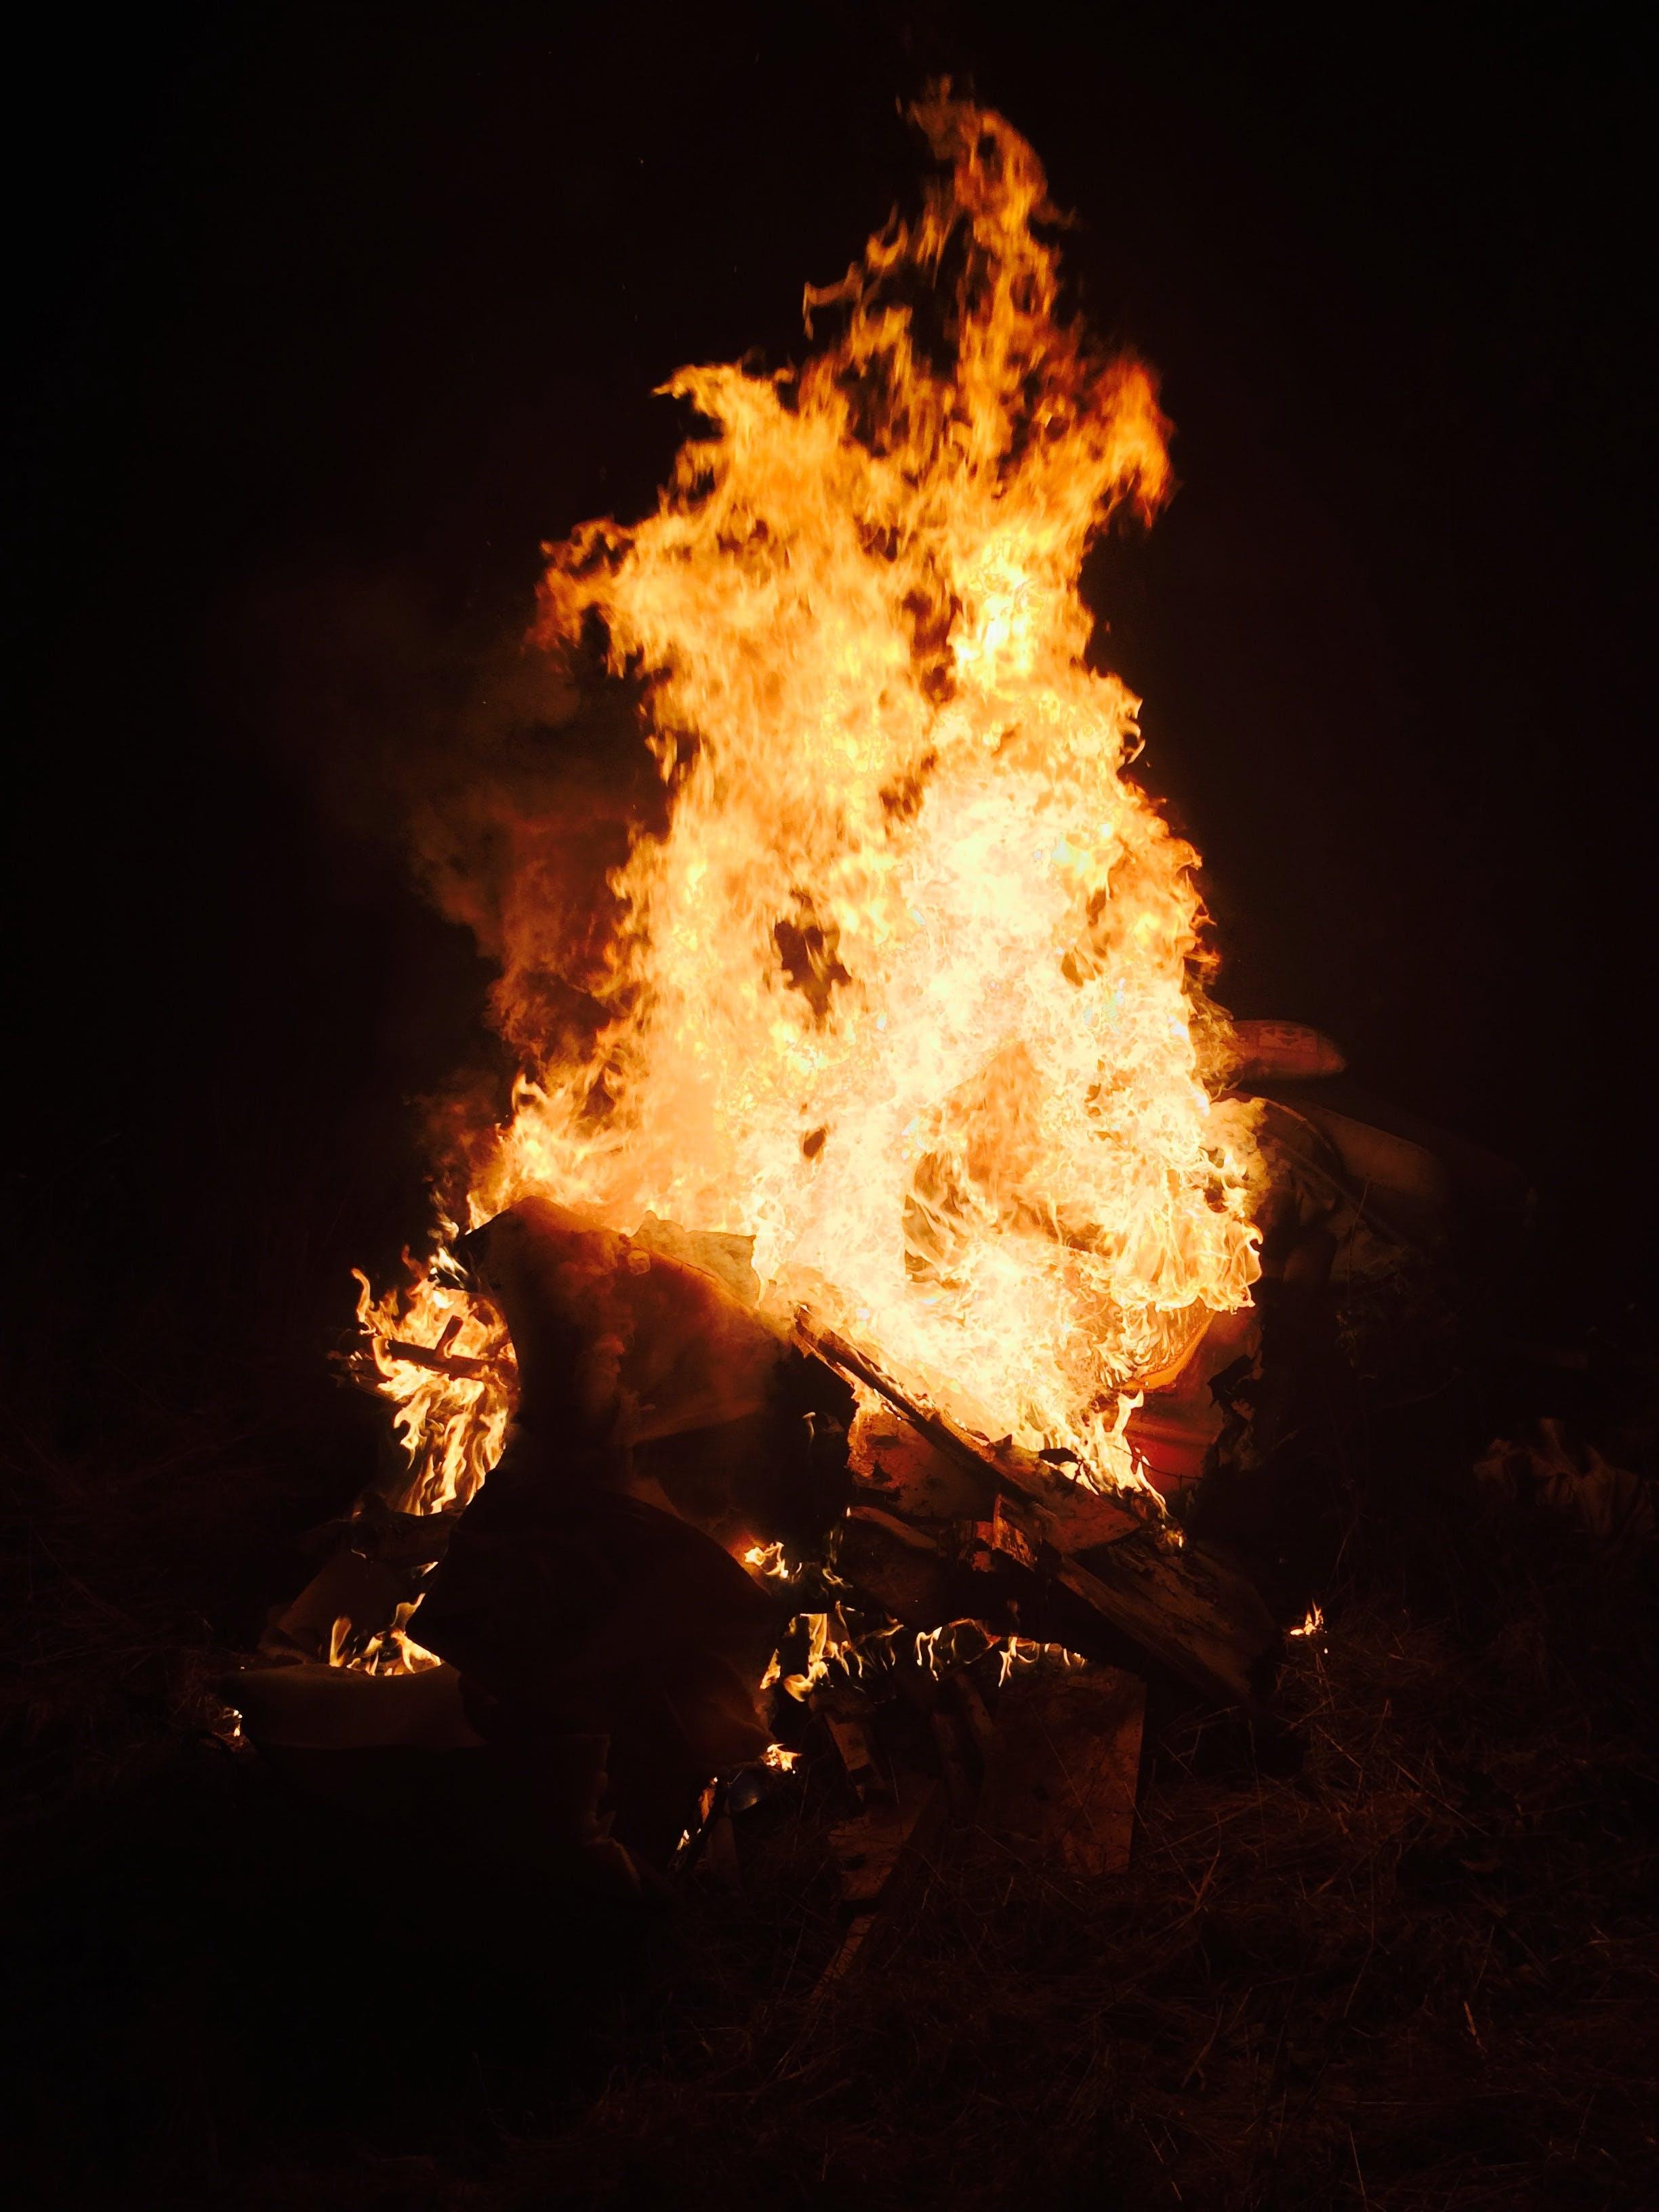 Free stock photo of fire, bonfire, blaze